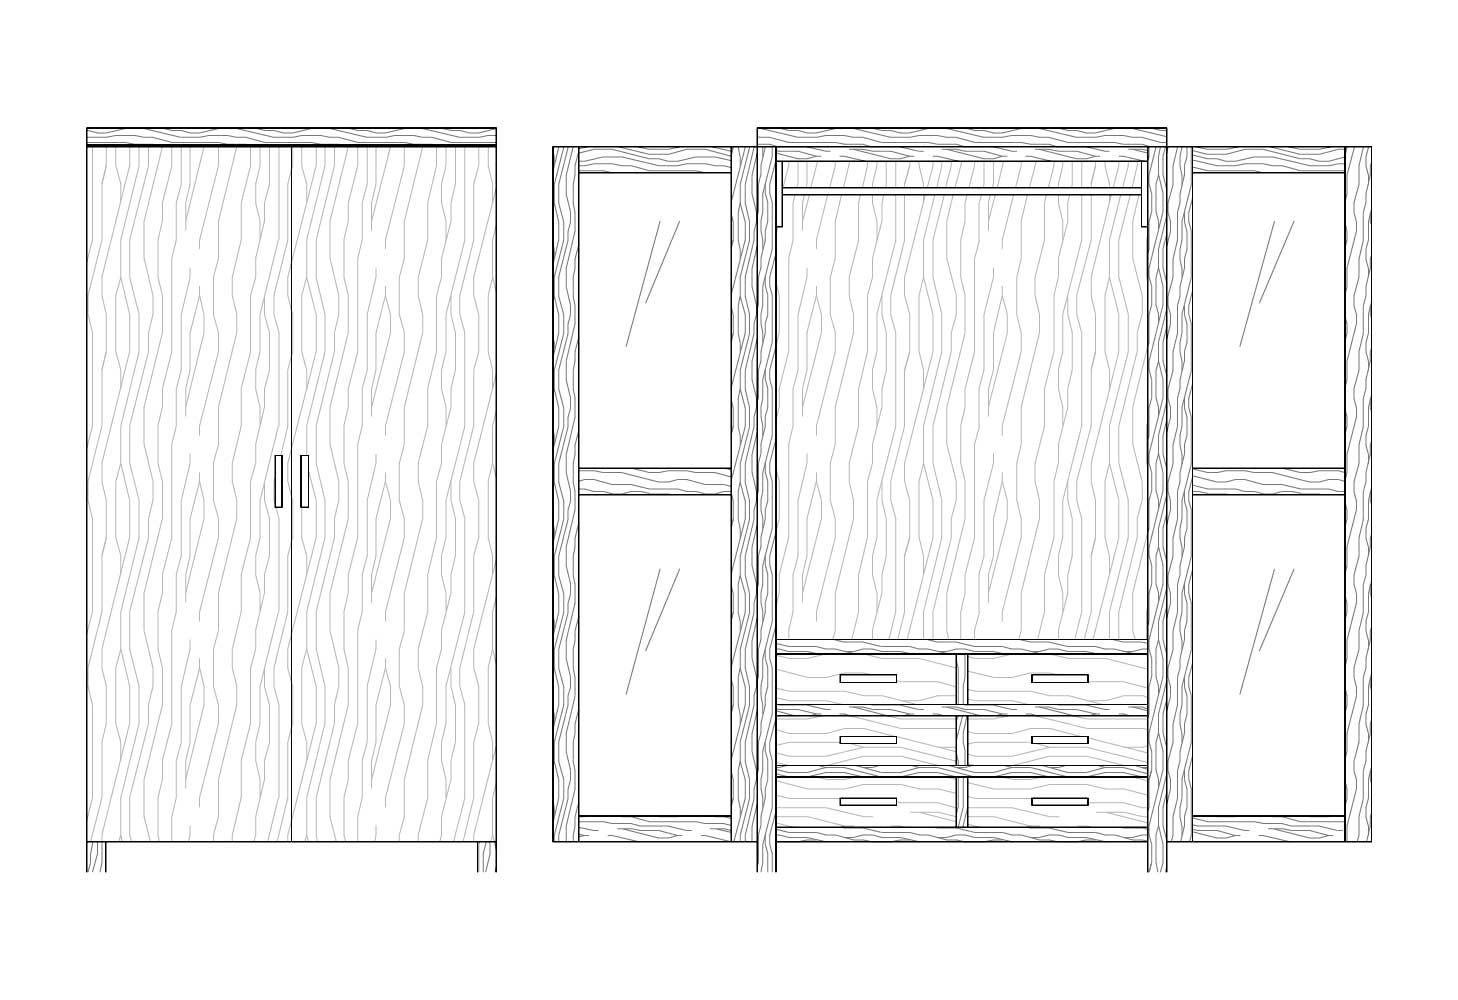 armadio-110-disegno